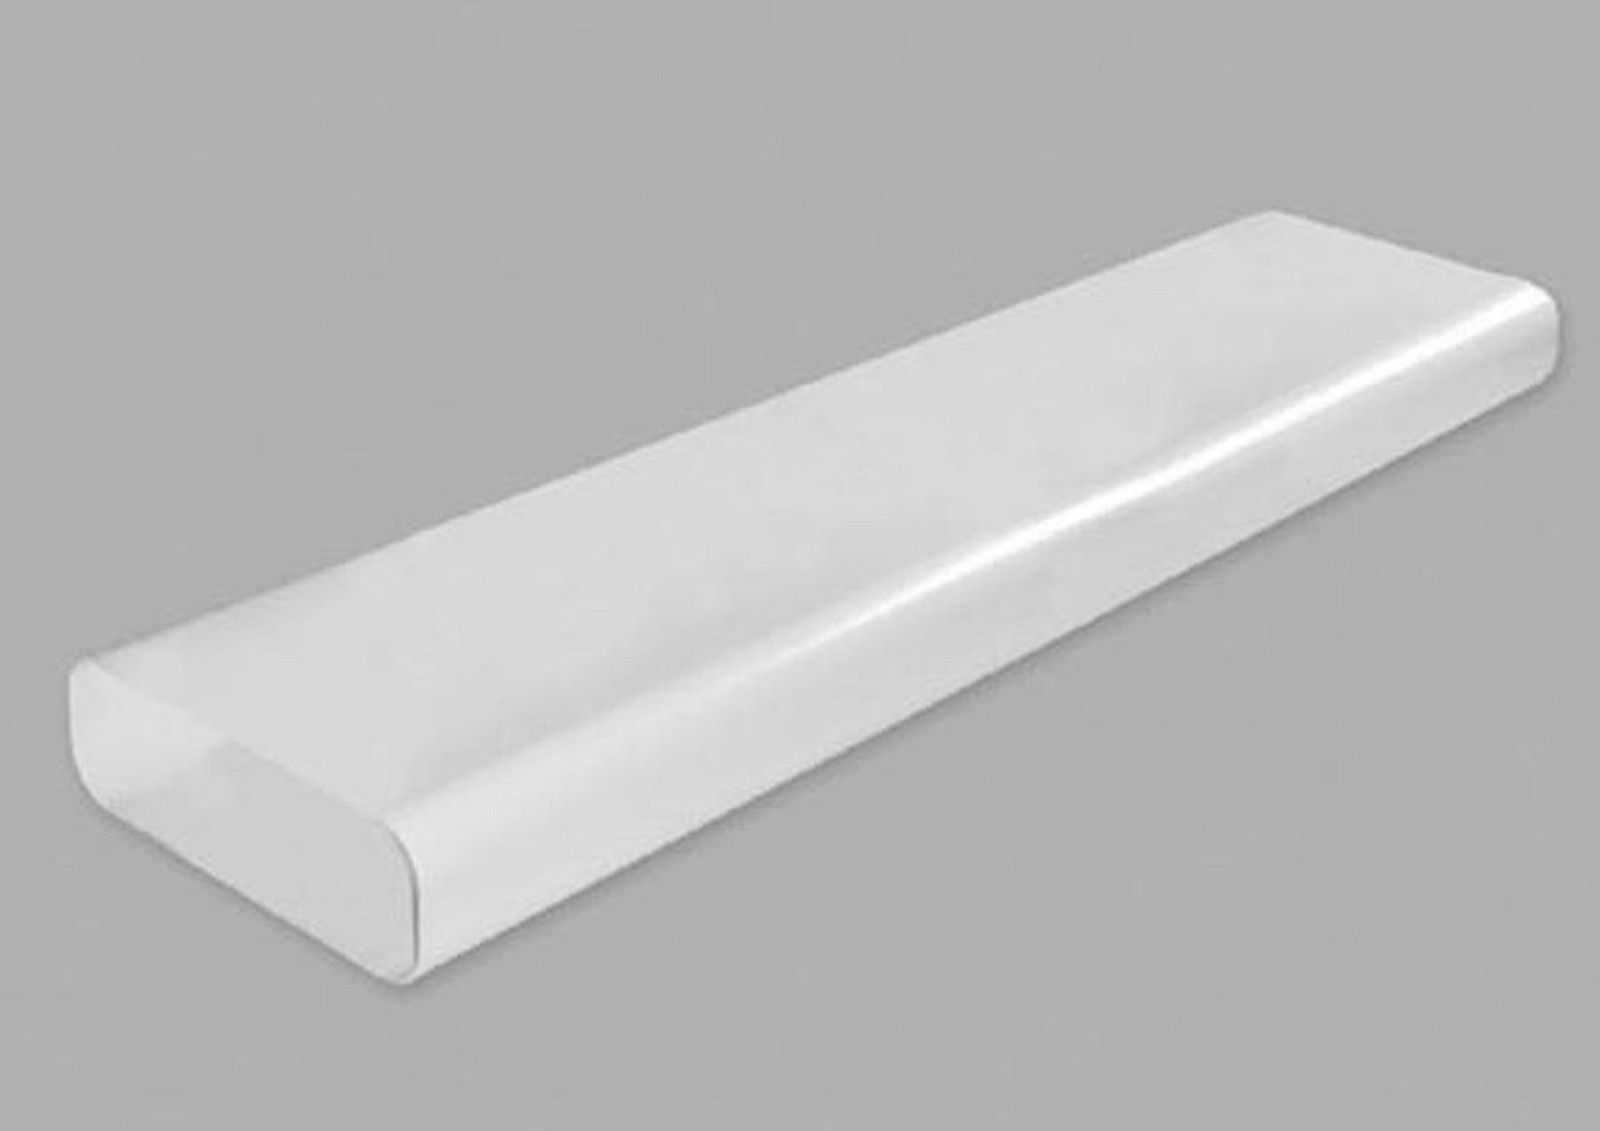 Abluft Küche power 150 flachkanal 230x80mm lüftungsrohr 100cm abluftkanal abluft